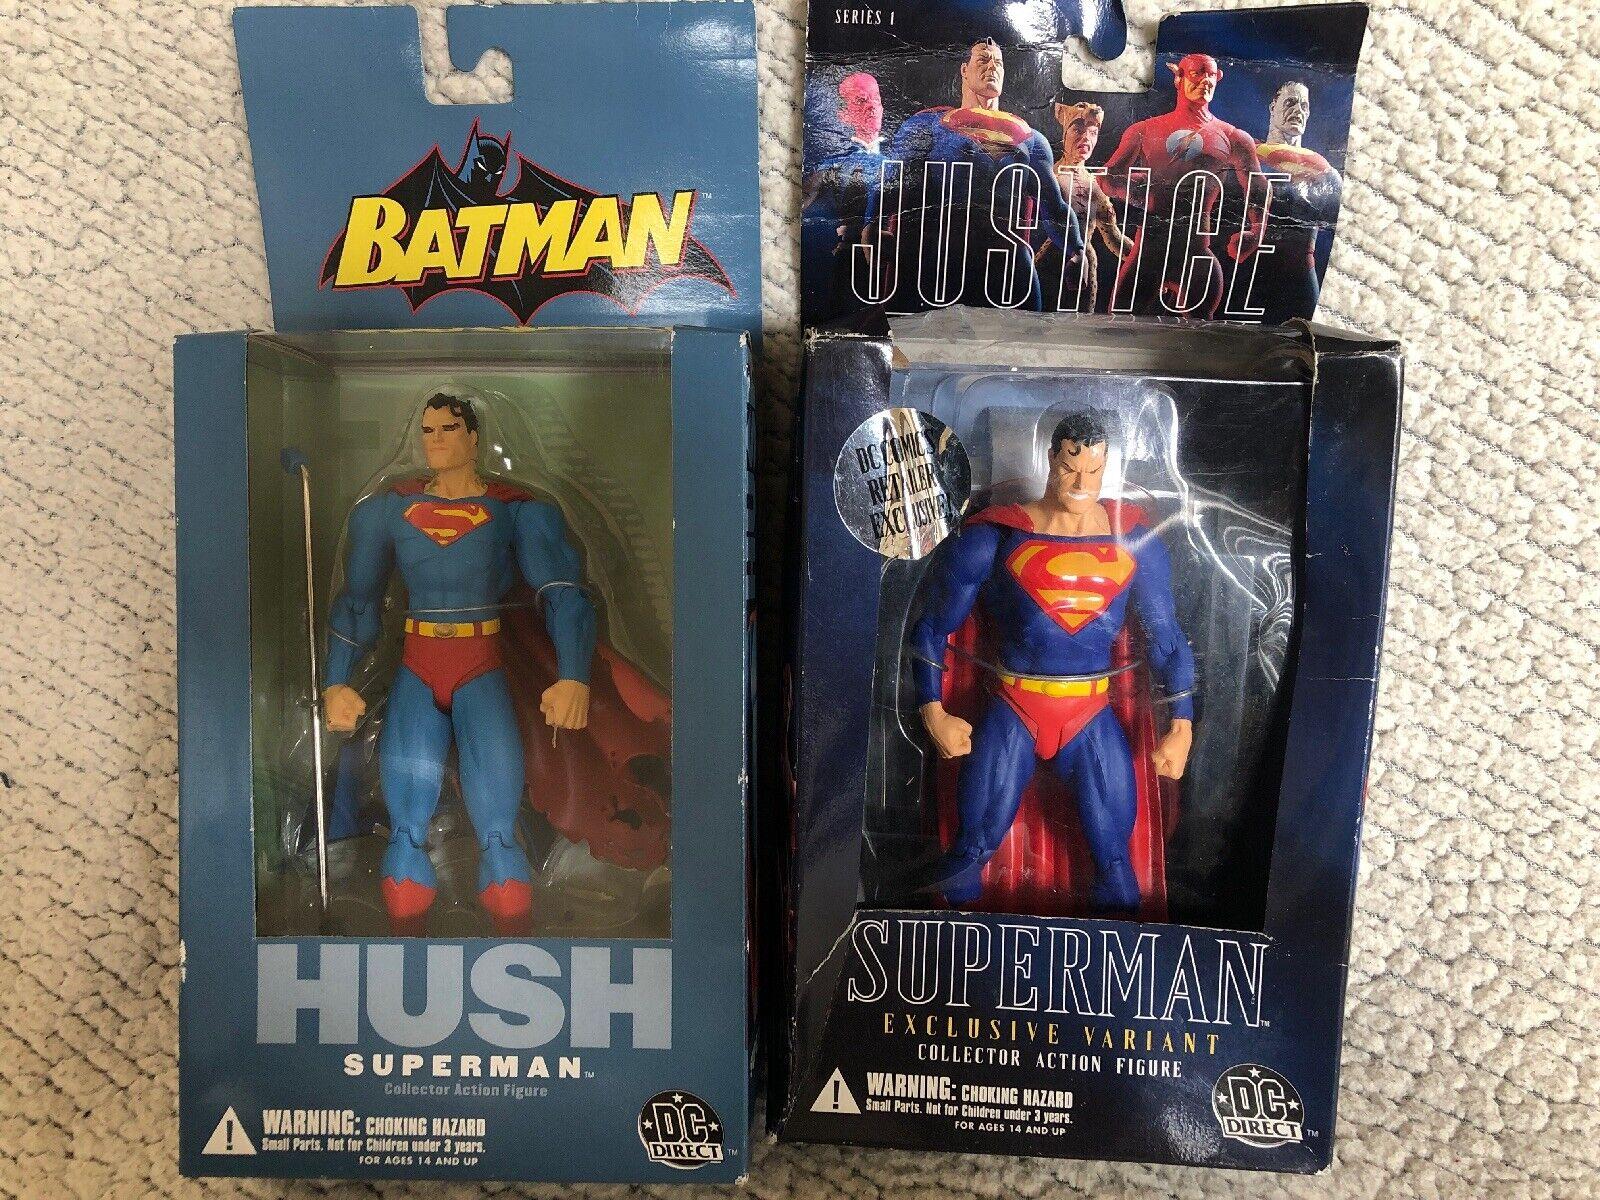 DC Direct HUSH SUPERMAN & Justice League SUPERMAN Series 1